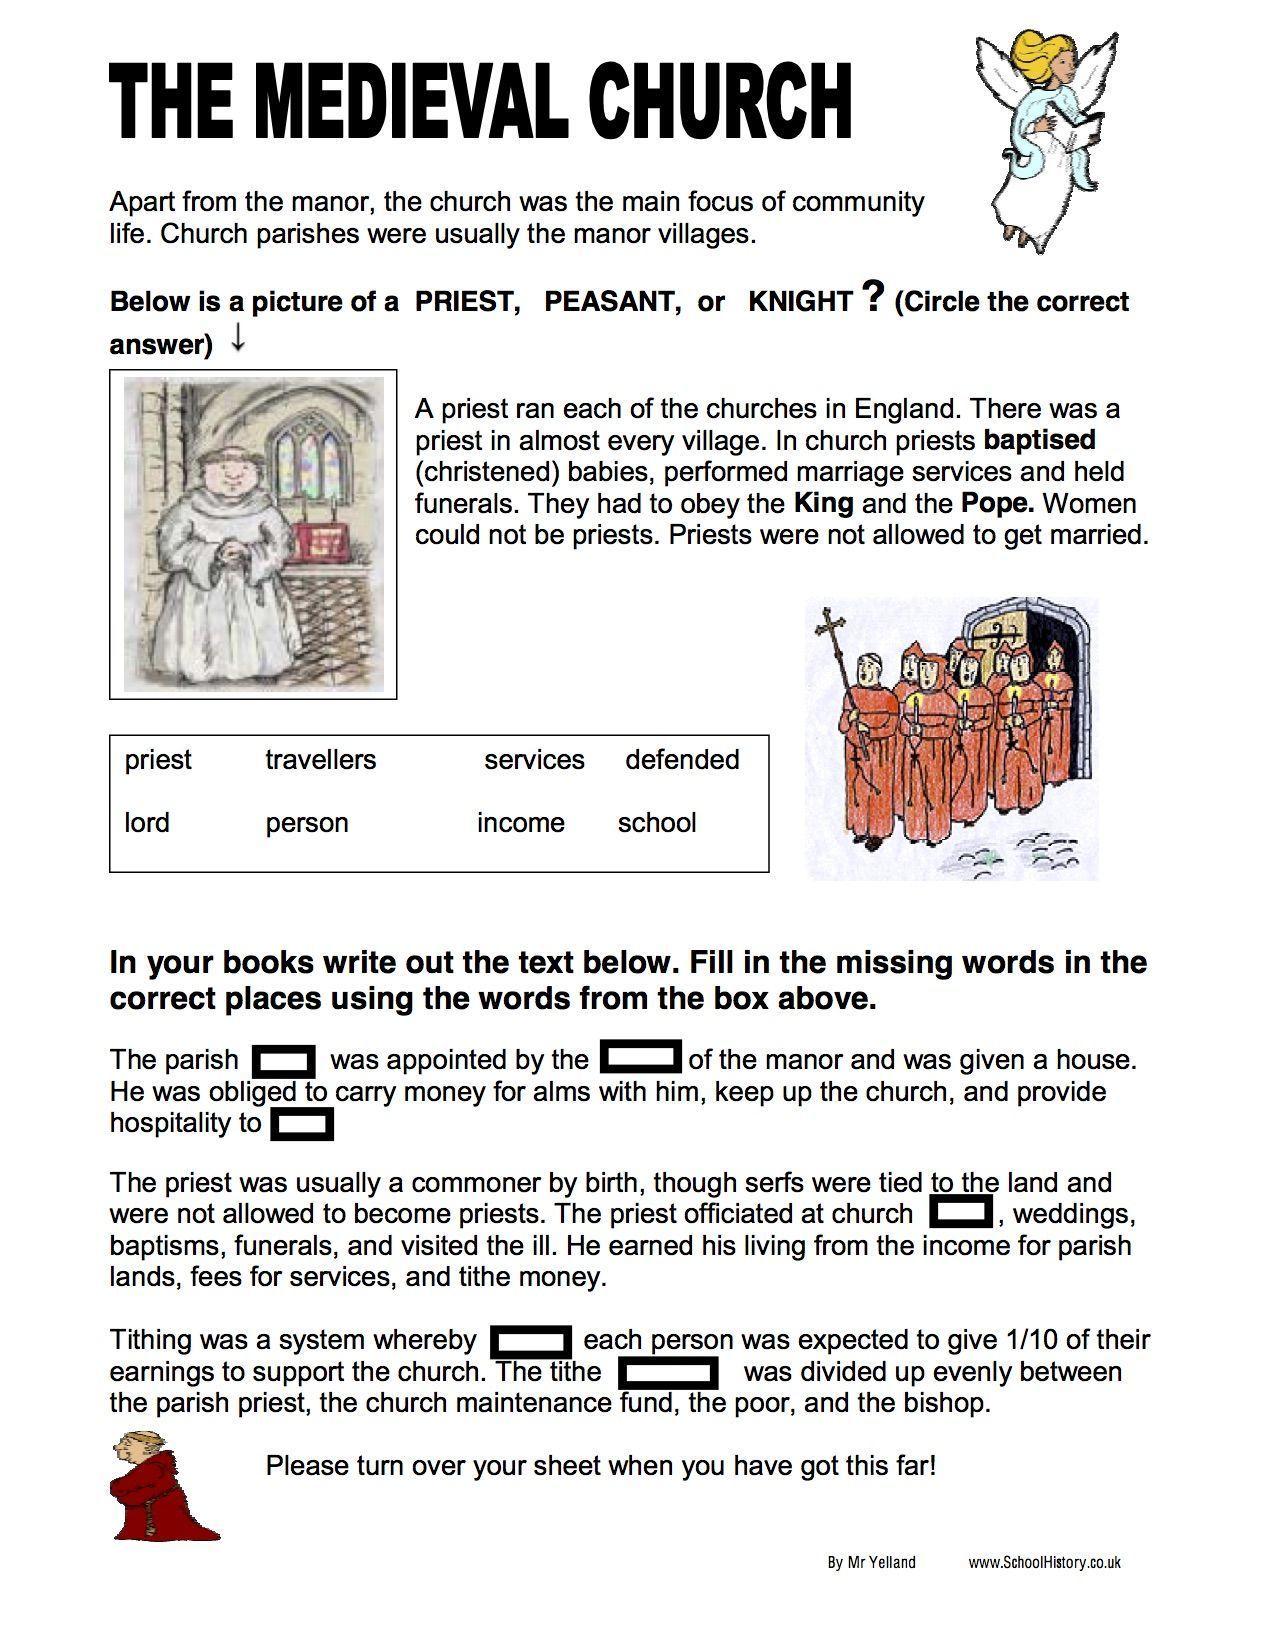 Free History Worksheets Ks3 Amp Ks4 Lesson Plans Amp Resources In 2020 History Worksheets Summarizing Worksheet Free Printable Worksheets [ 1650 x 1275 Pixel ]